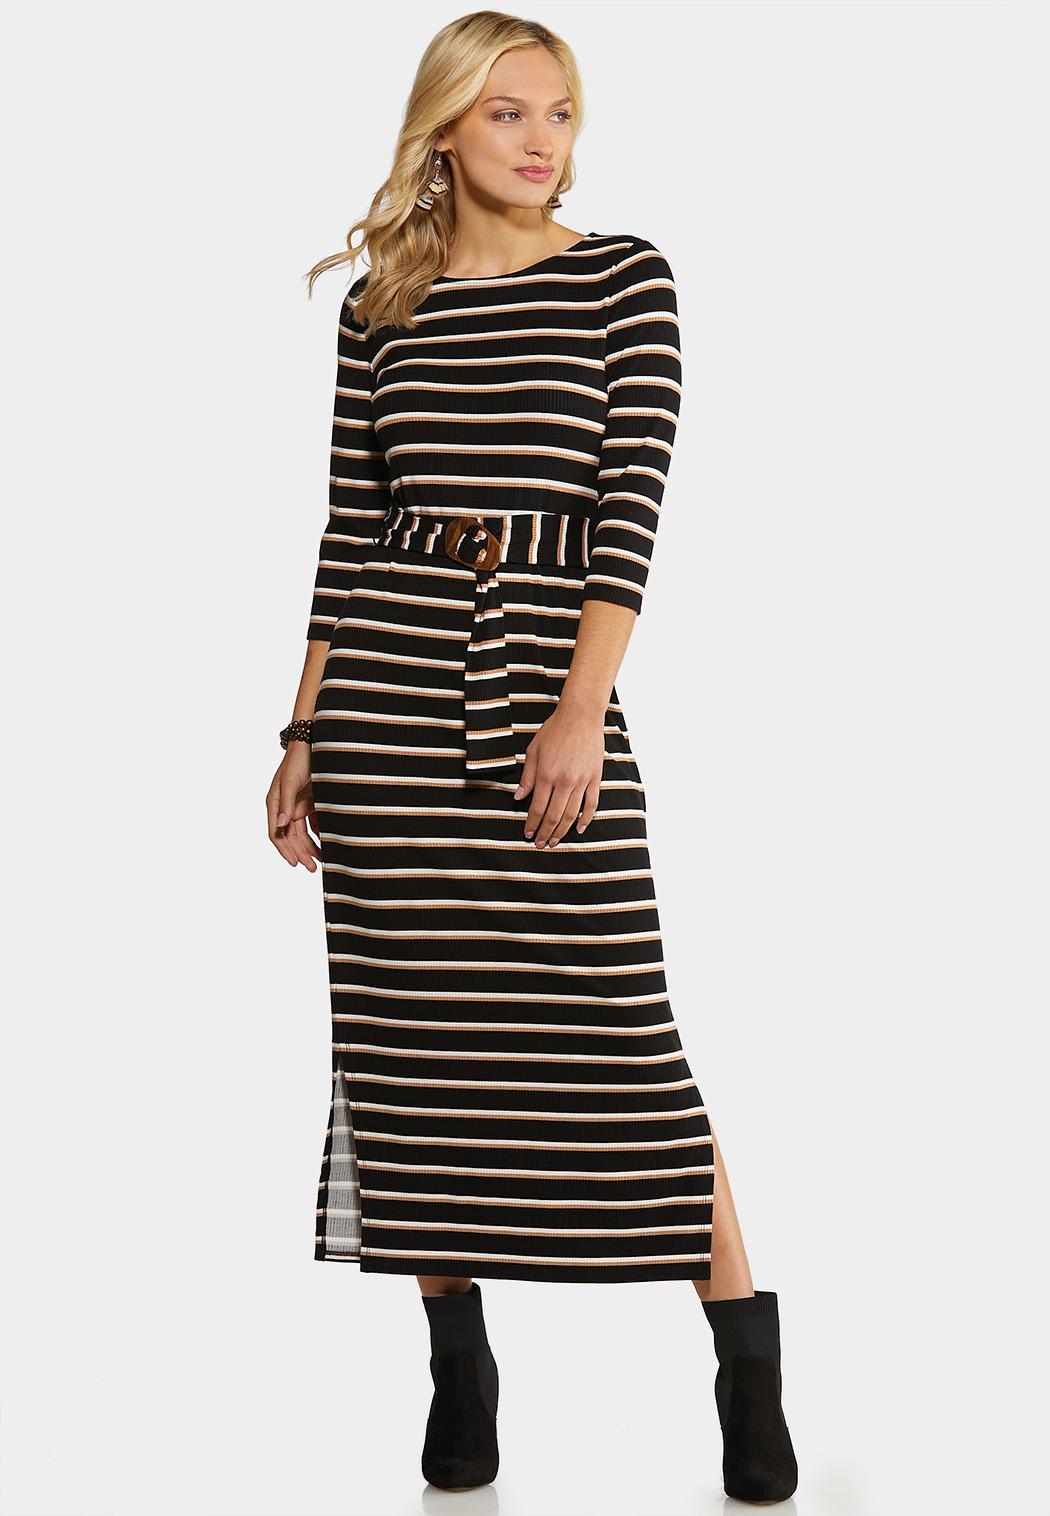 Plus Size Belted Stripe Knit Dress Midi Cato Fashions